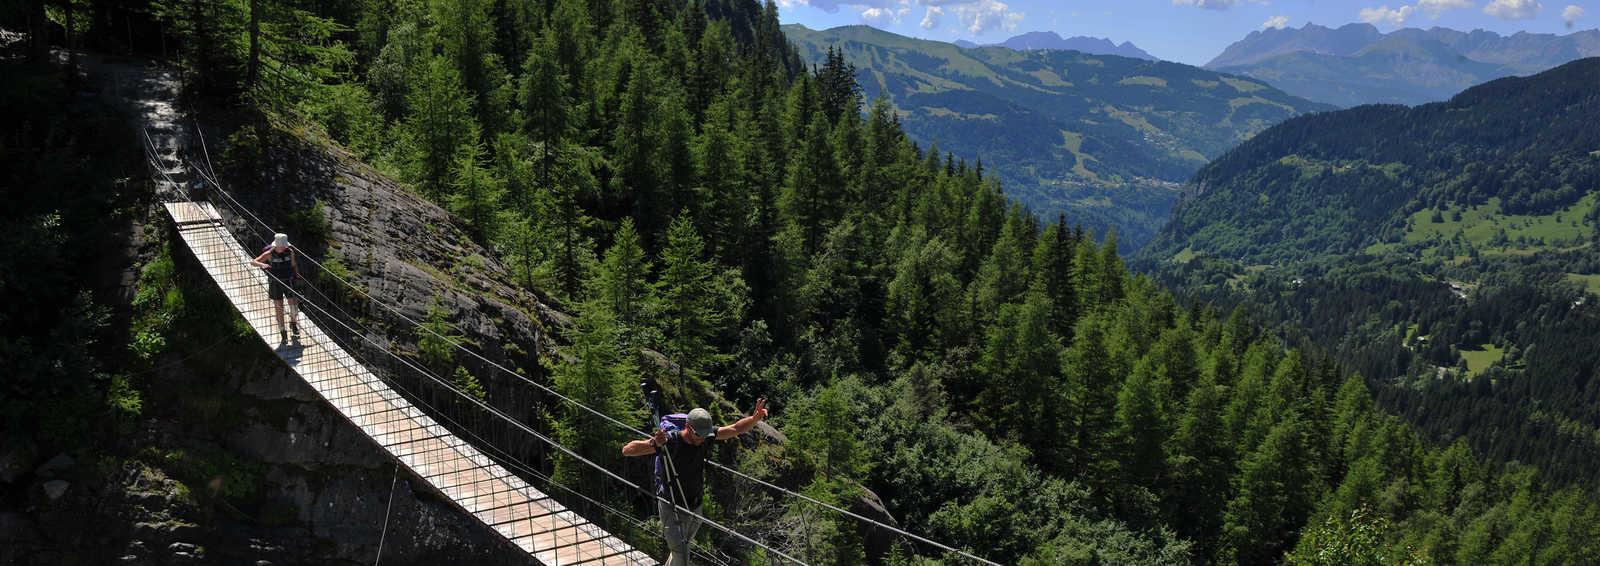 Bridge on the Mont Blanc Circuit, France